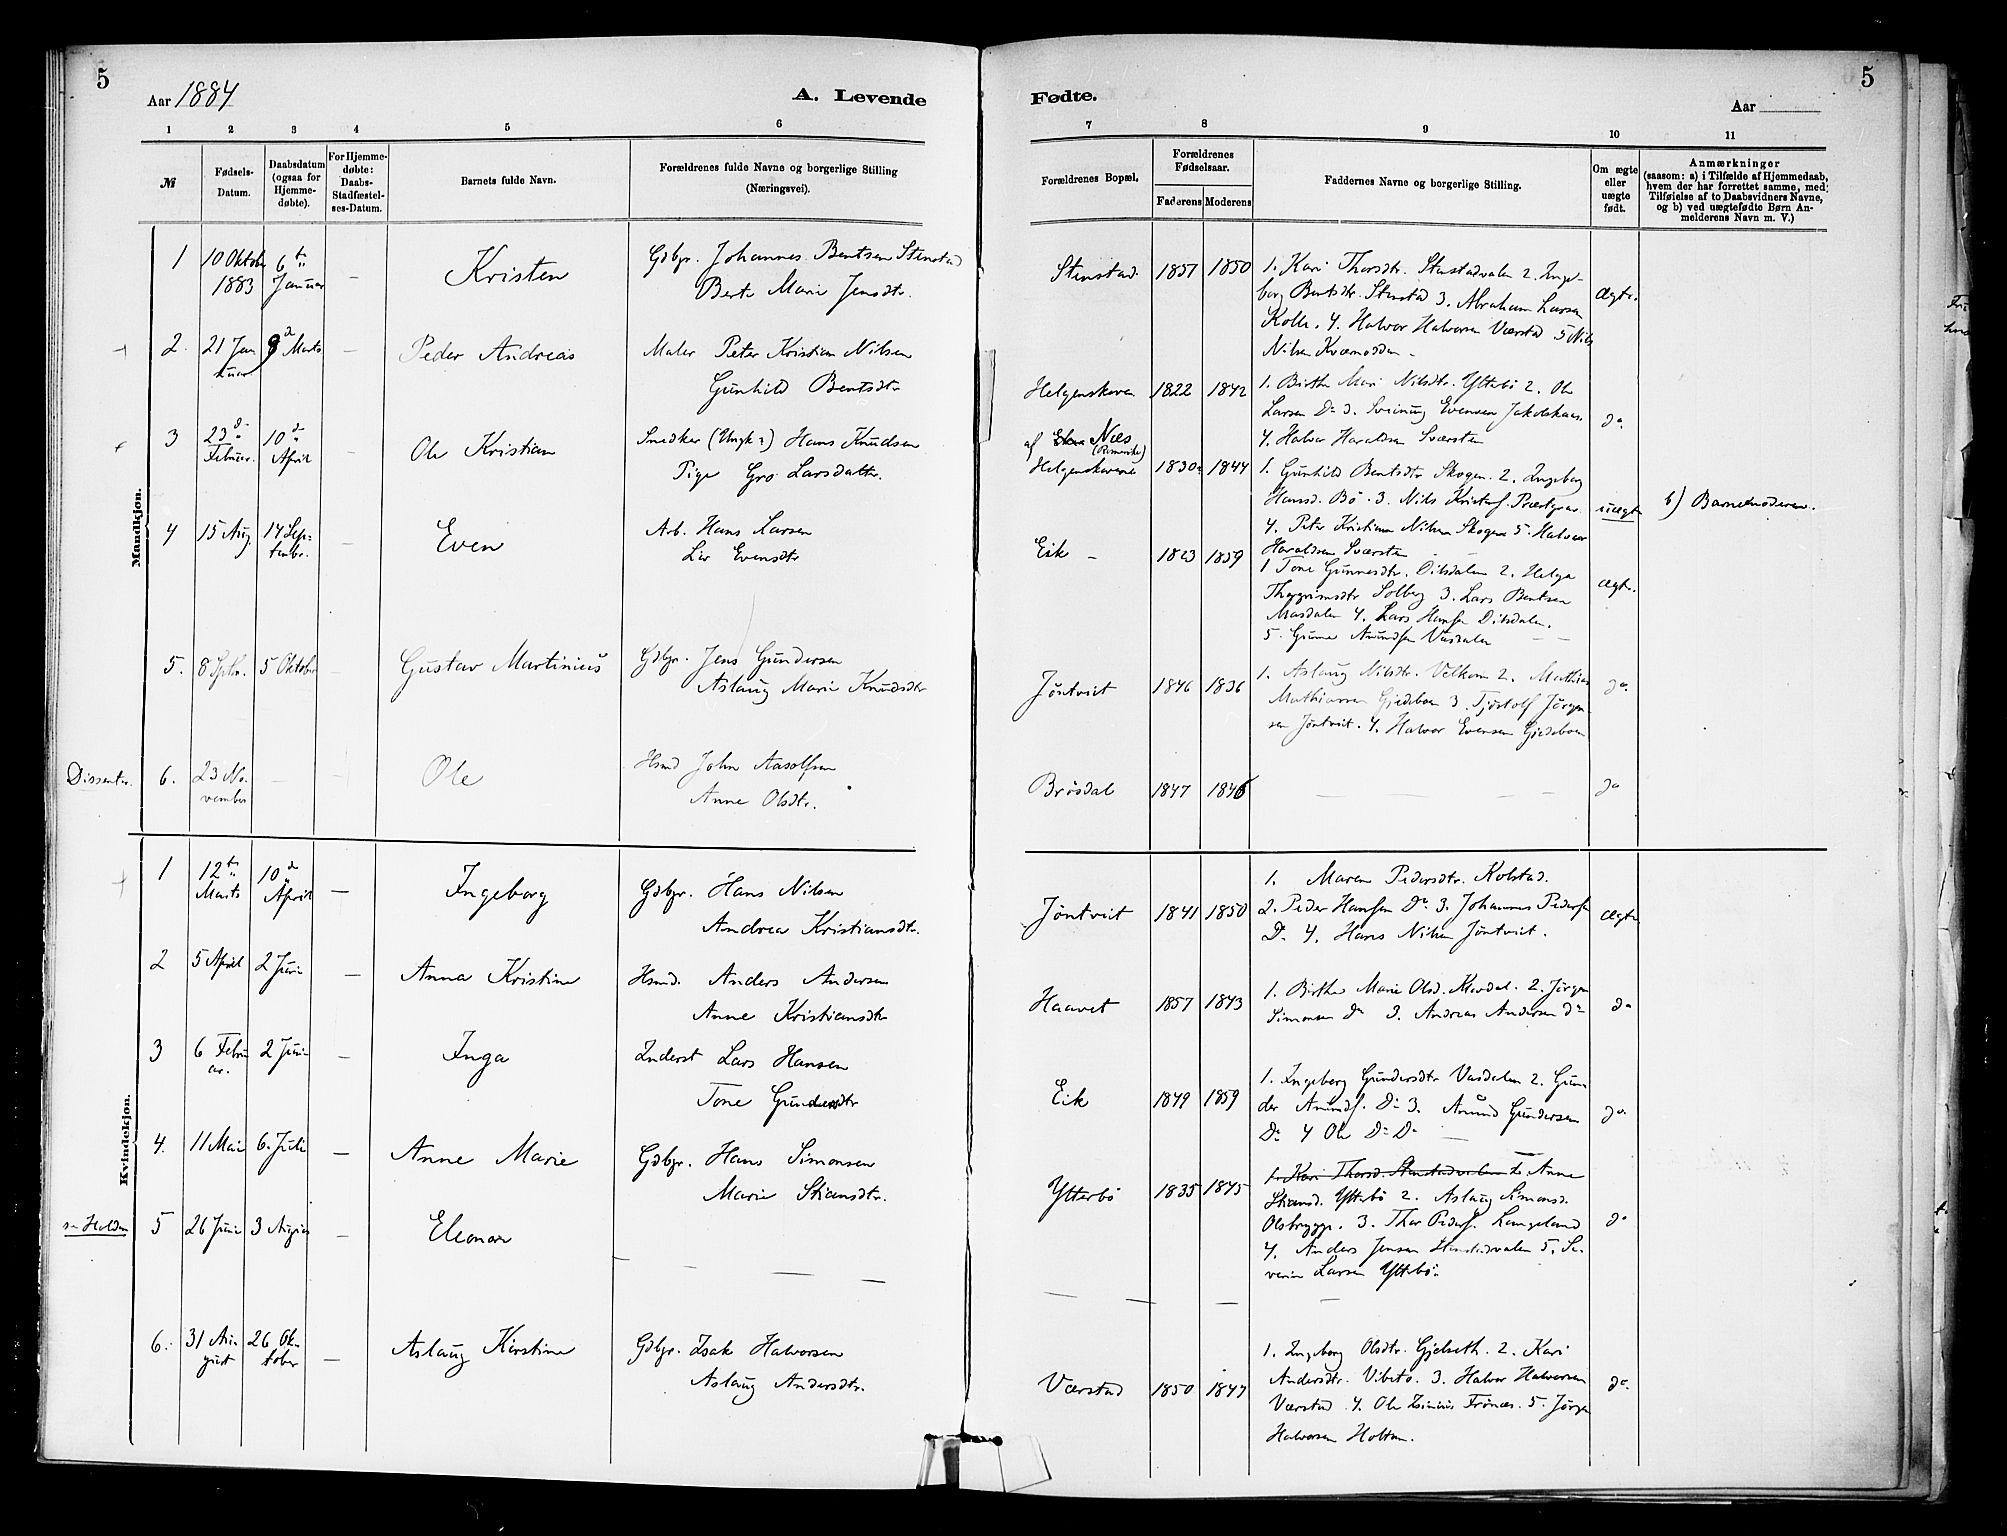 SAKO, Holla kirkebøker, F/Fa/L0009: Ministerialbok nr. 9, 1881-1897, s. 5